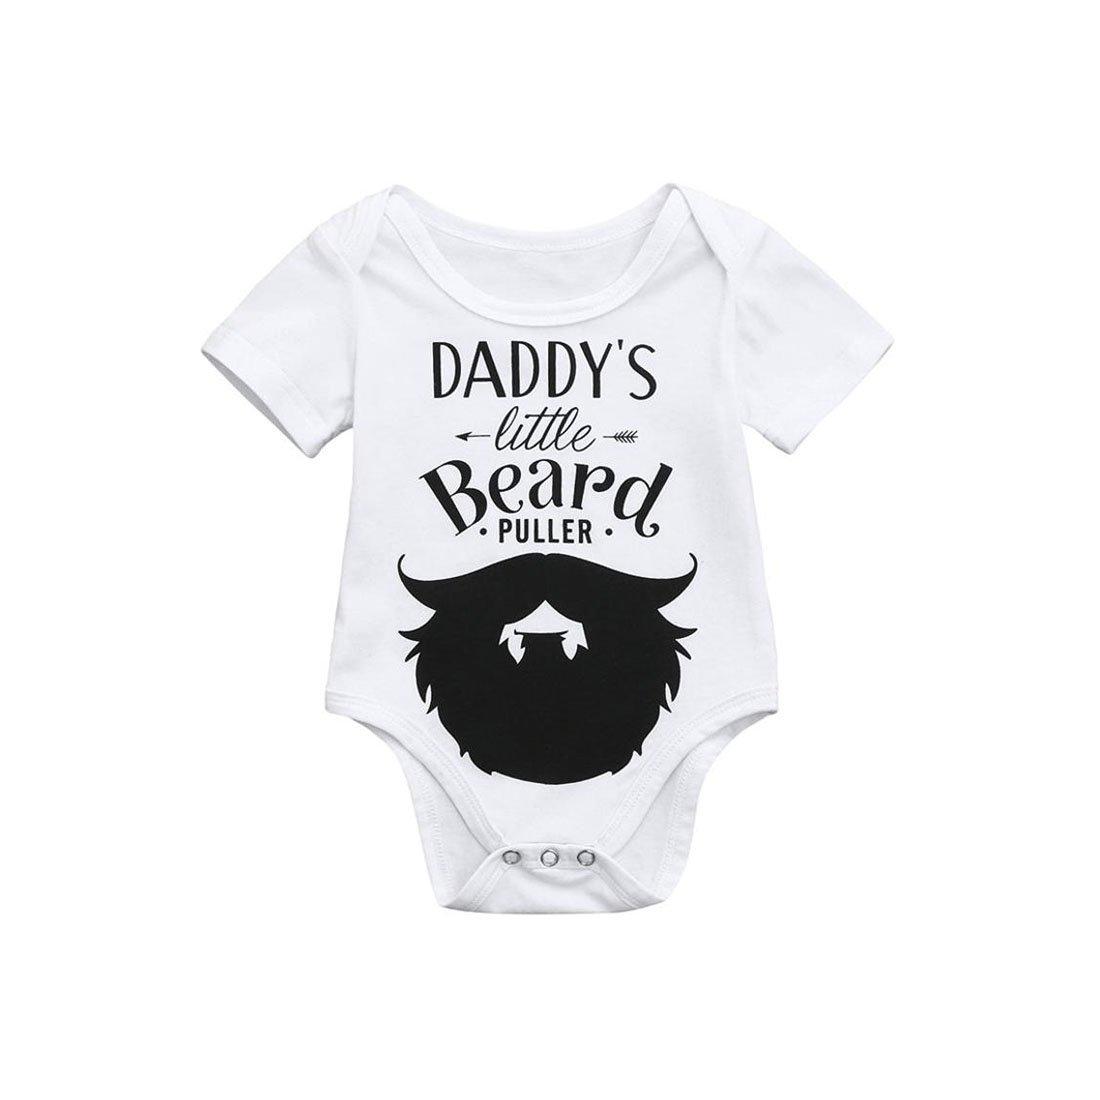 Molyveva Infant Baby Girl Boy Romper Short Sleeve Jumpsuit Funny Dad Beard Gift Old Tree Store